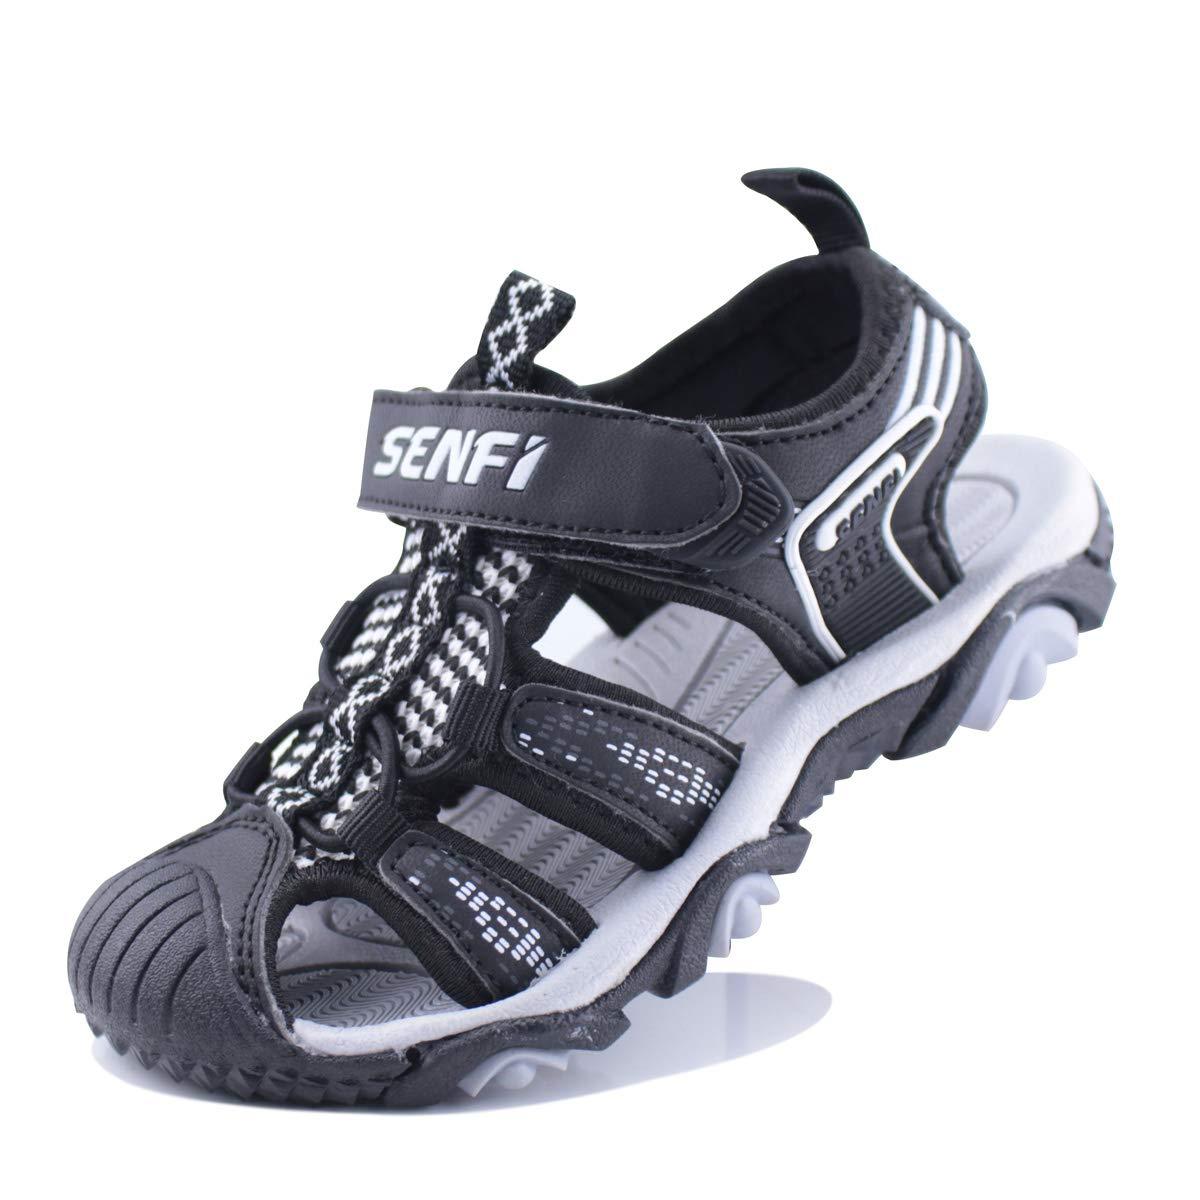 SENFI Boys Sport Sandal Summer Breathable Closed-Toe Strap Walking Shoes,BSF-black-32